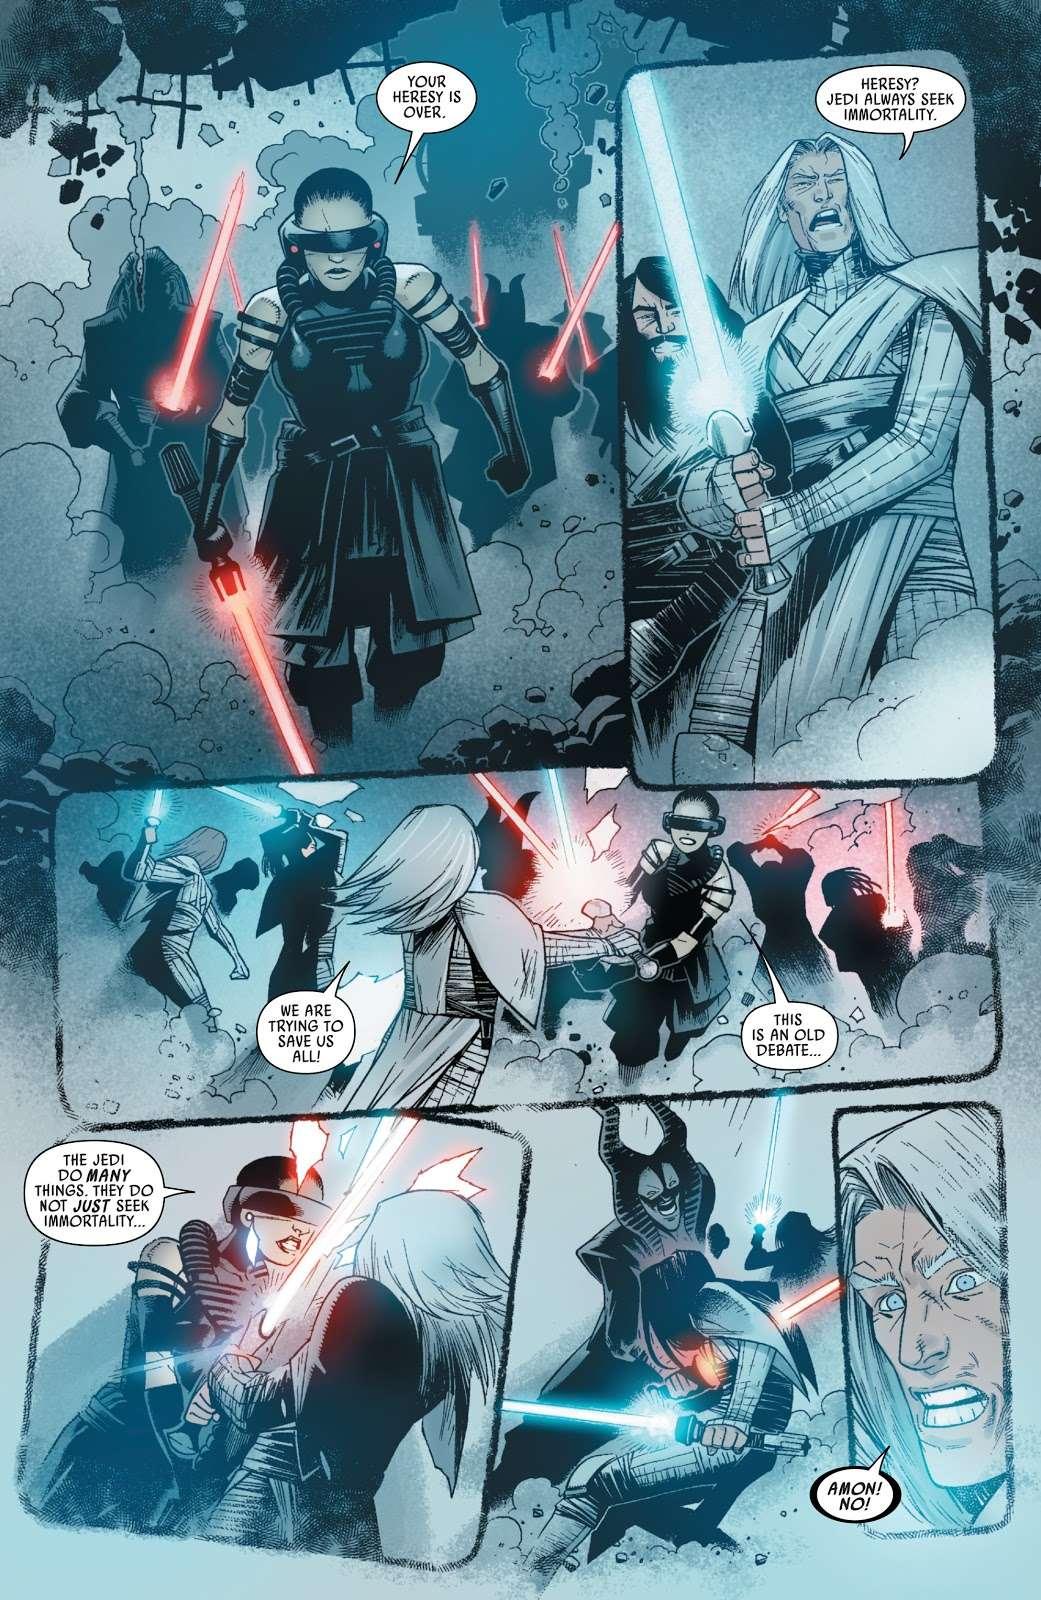 ortodossa dottrina jedi eretici ordu aspectu, L'Ordu Aspectu: gli eretici dell'Ordine Jedi – Guida al Canon, Star Wars Addicted